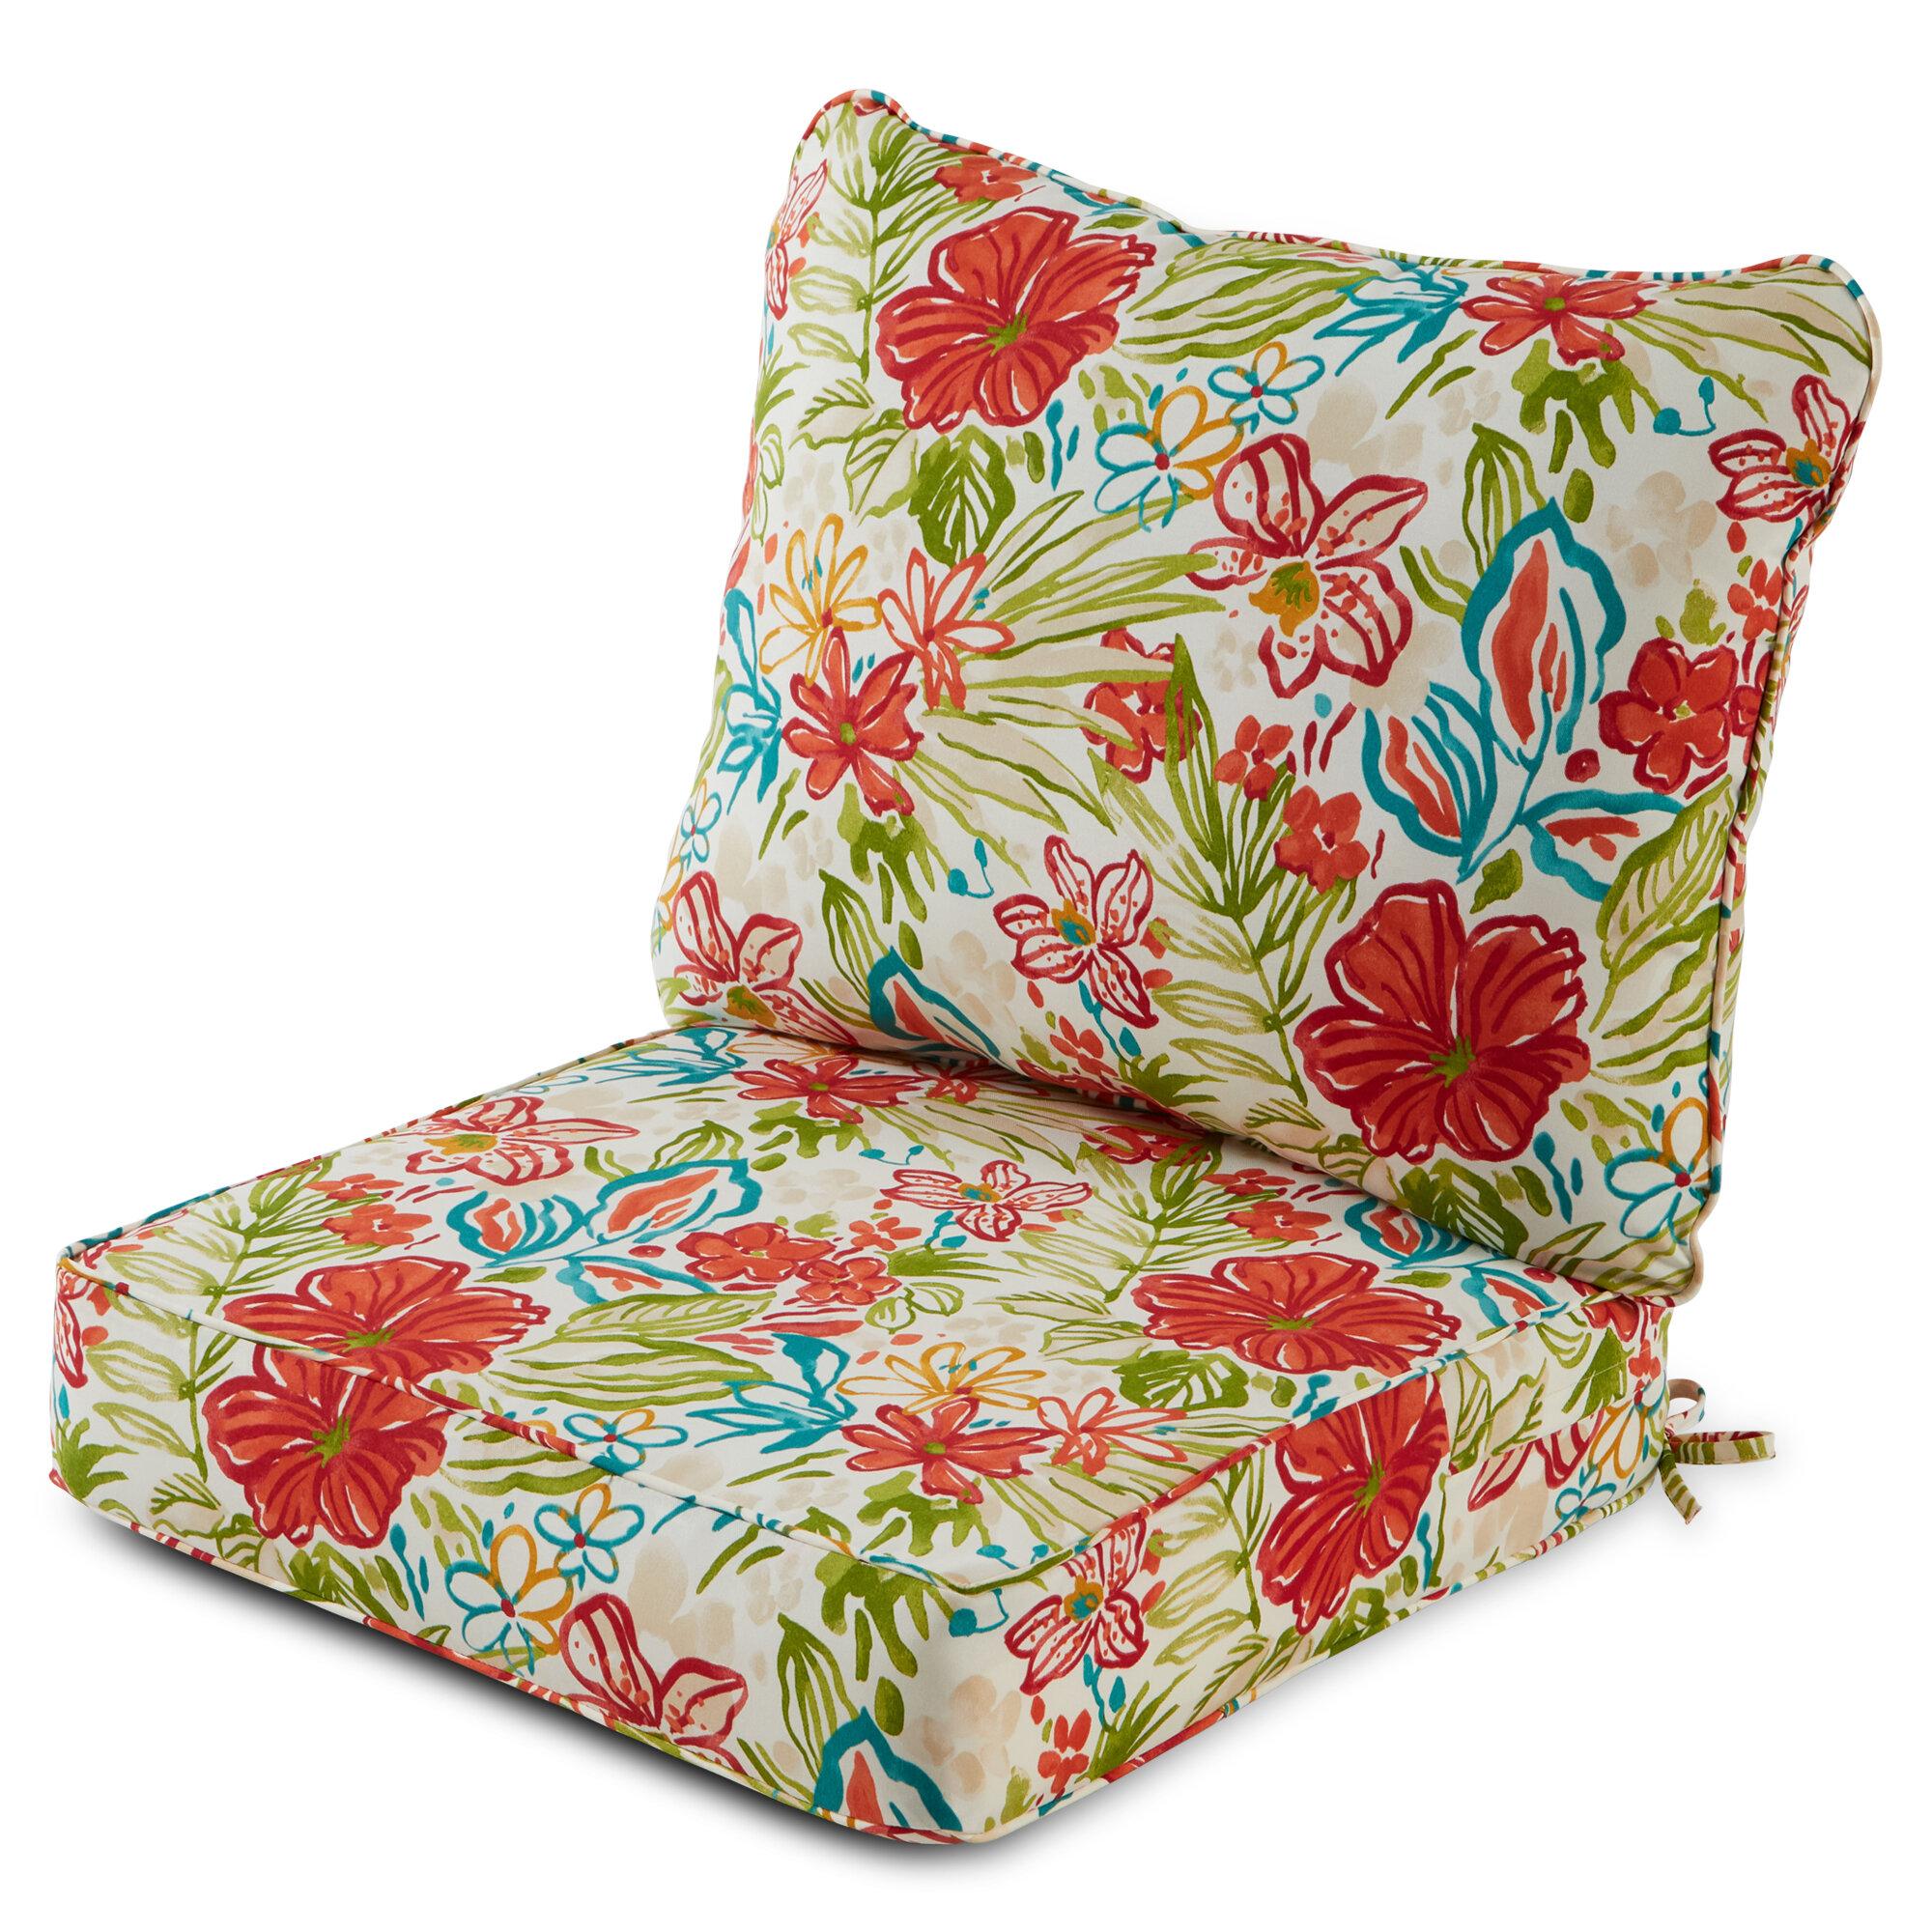 Ebern Designs 2 Piece Deep Seat Outdoor Replacement Cushion Set